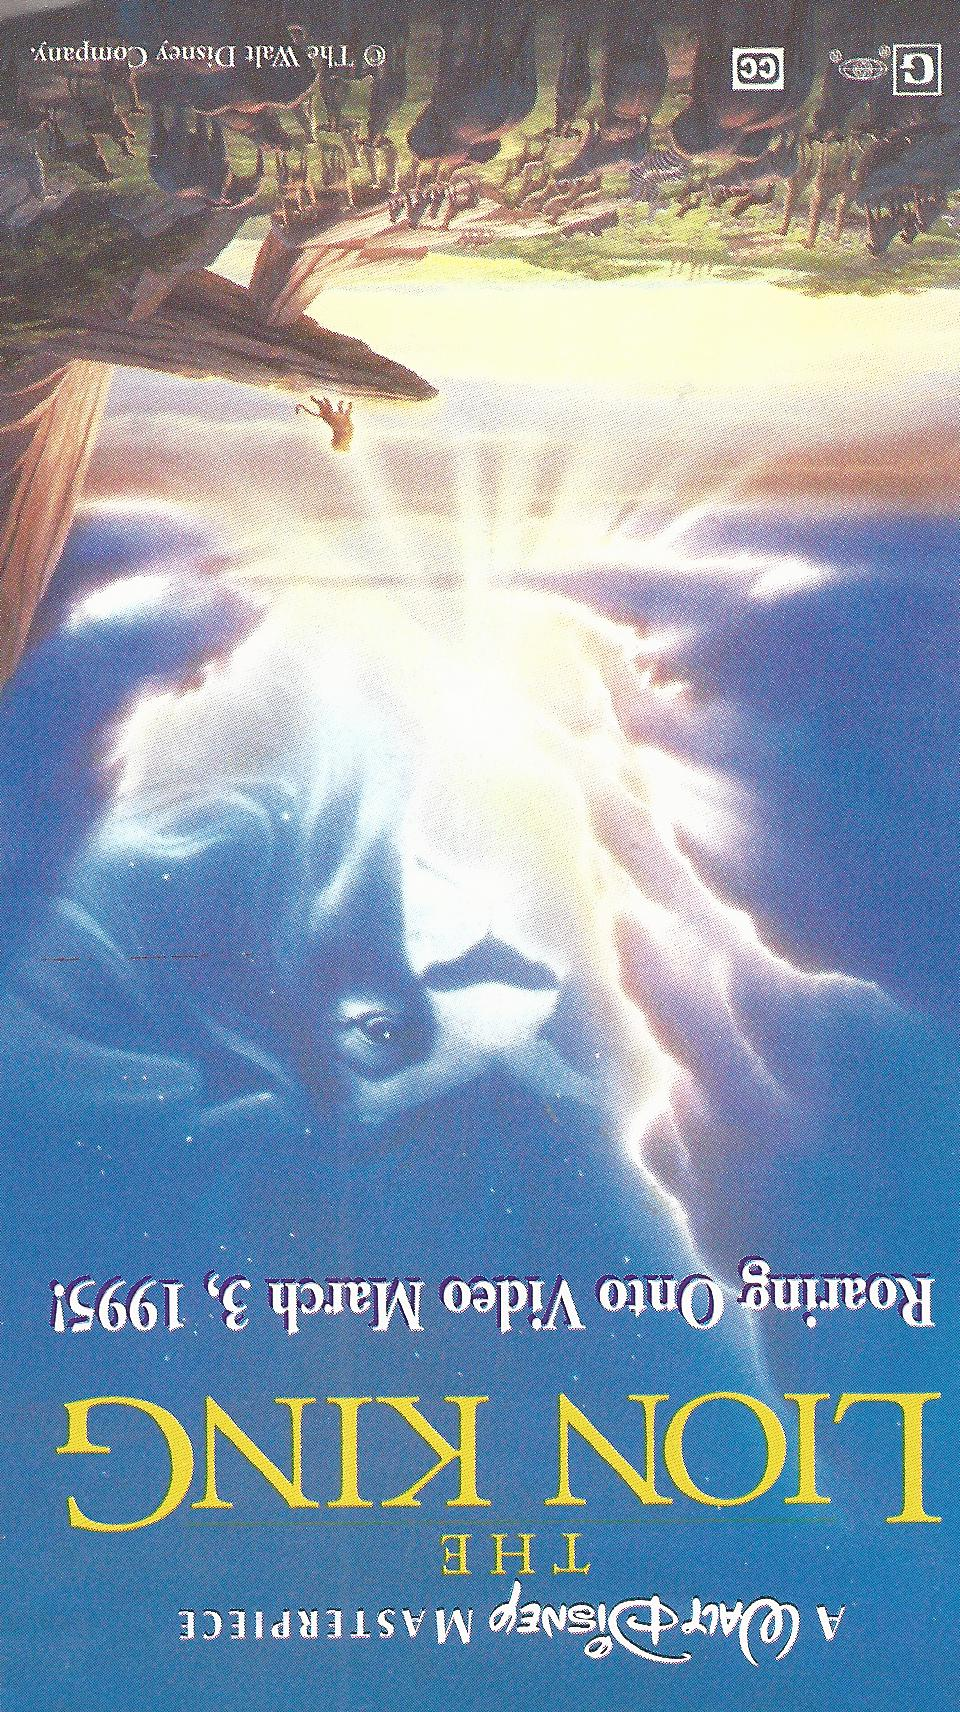 image - disney u0026 39 s the lion king